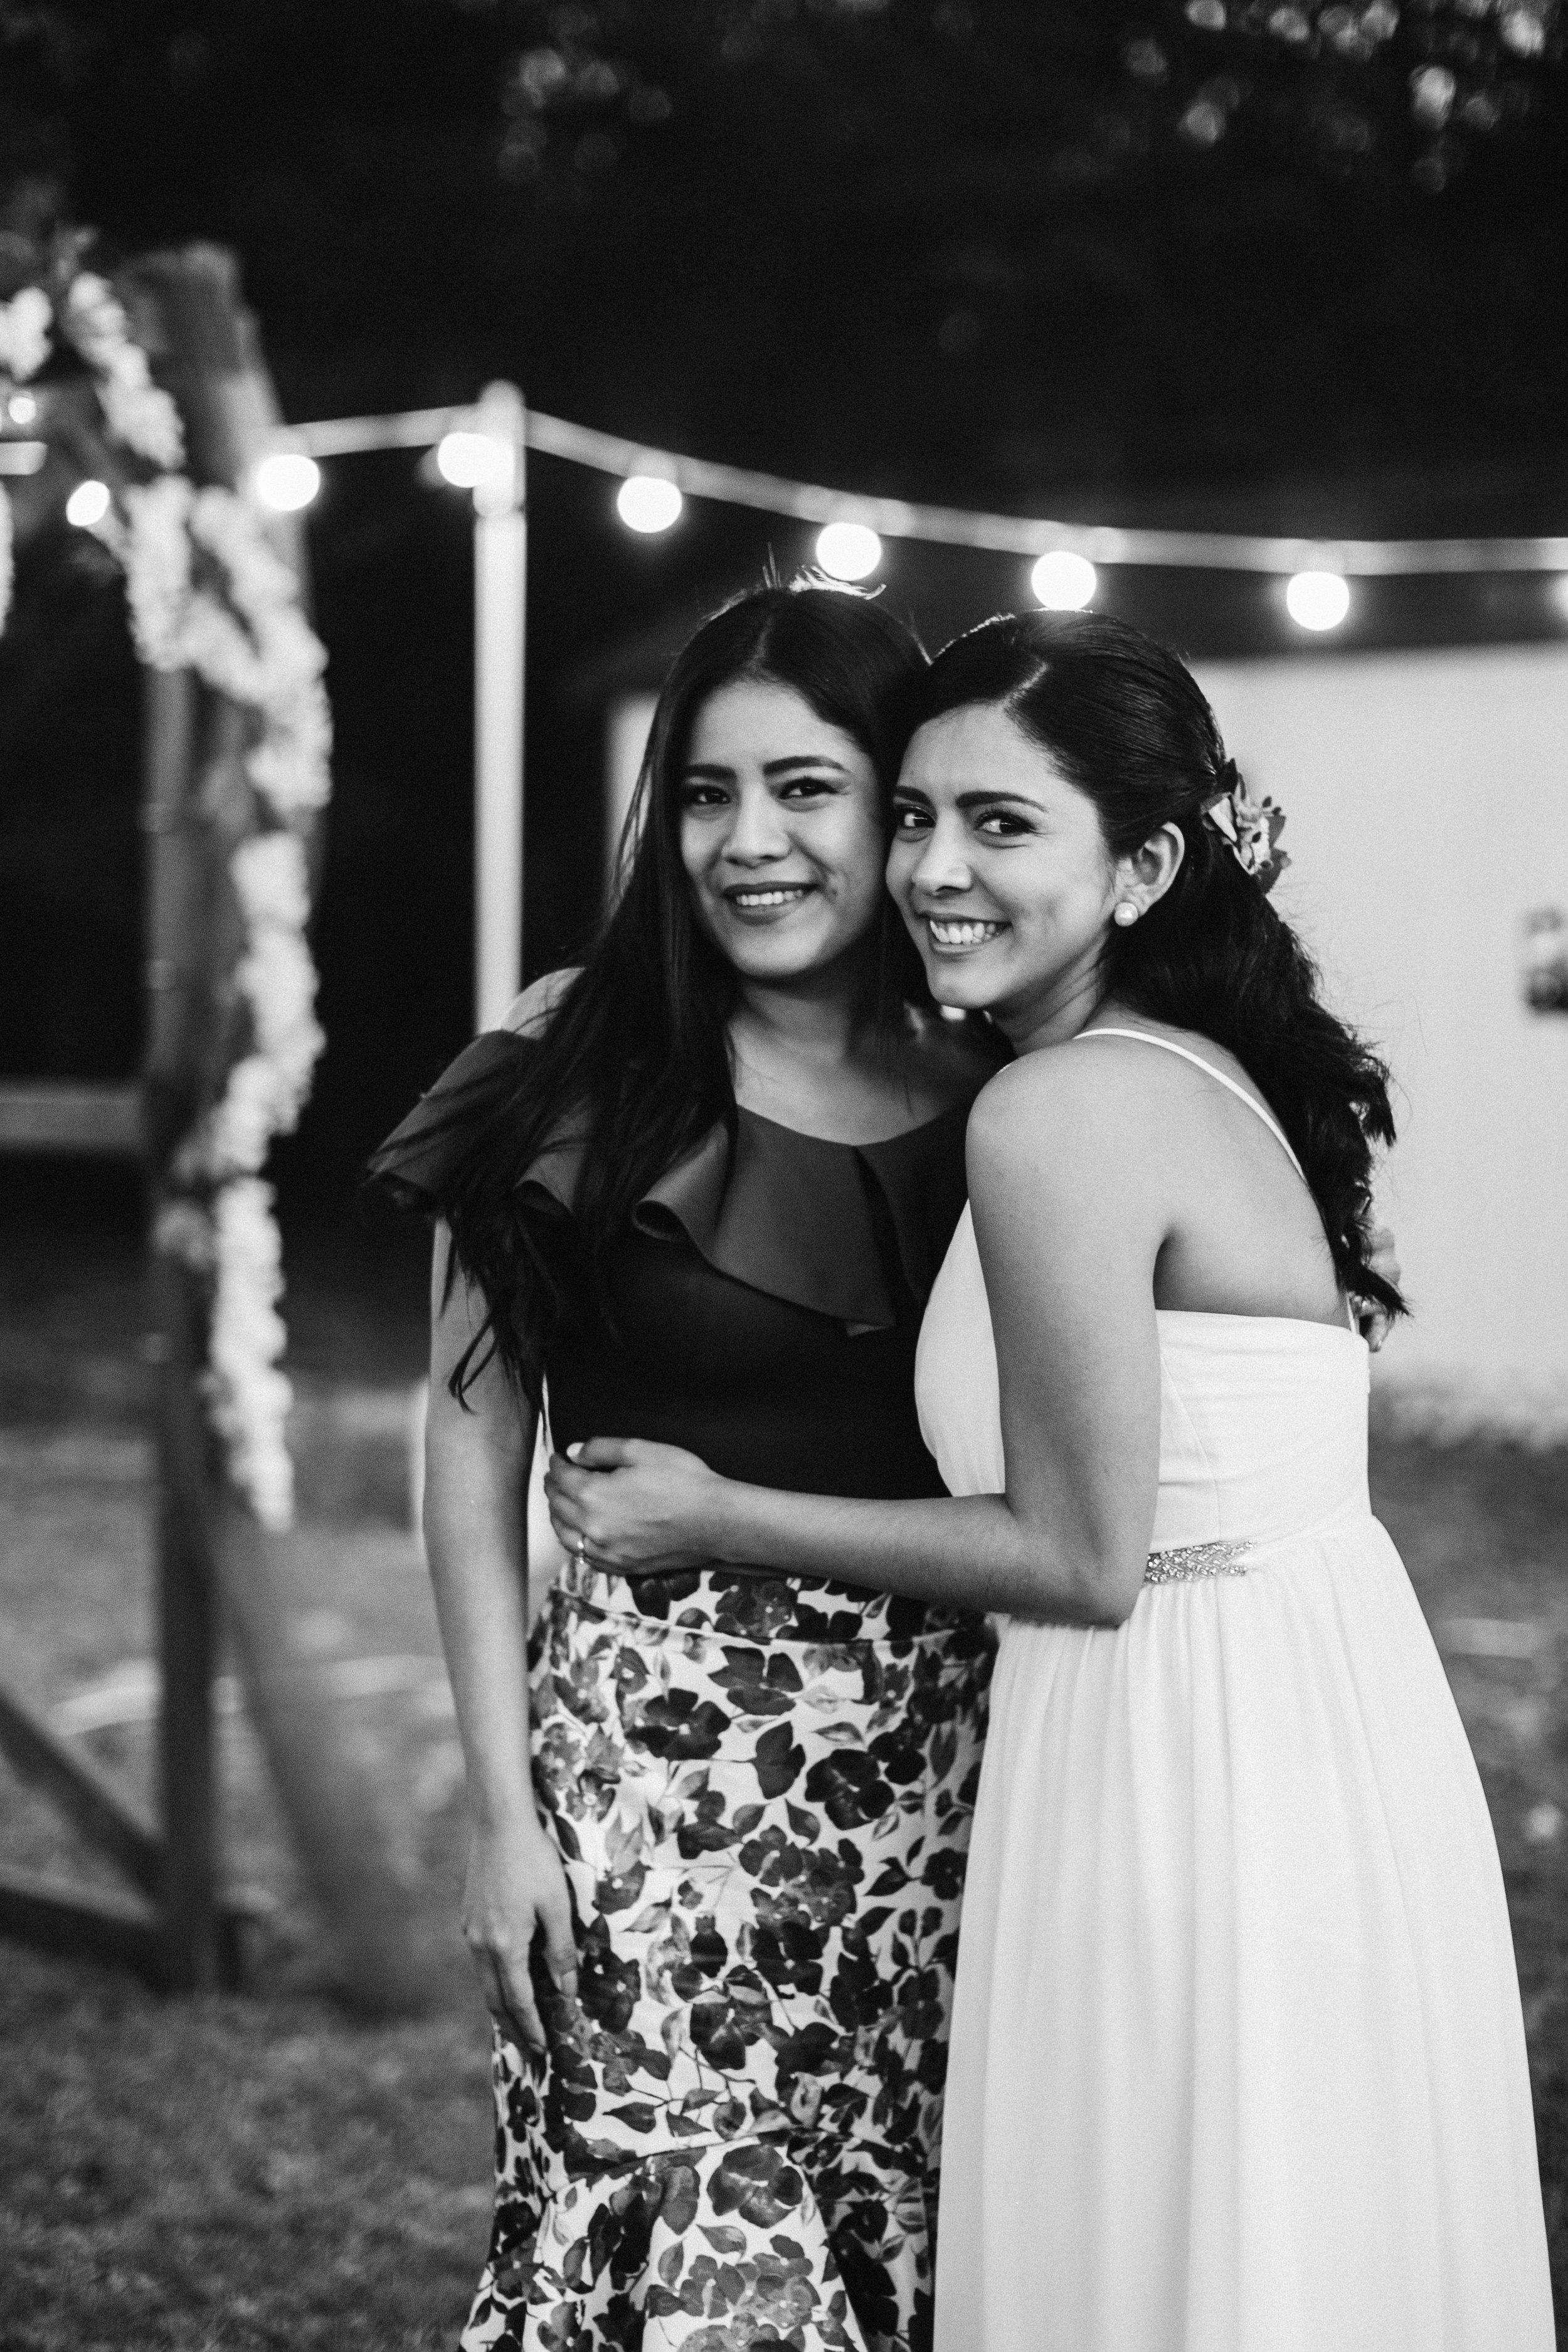 2018.11.03 Jael and Edel Ocala Wedding FINALS (404 of 441).jpg